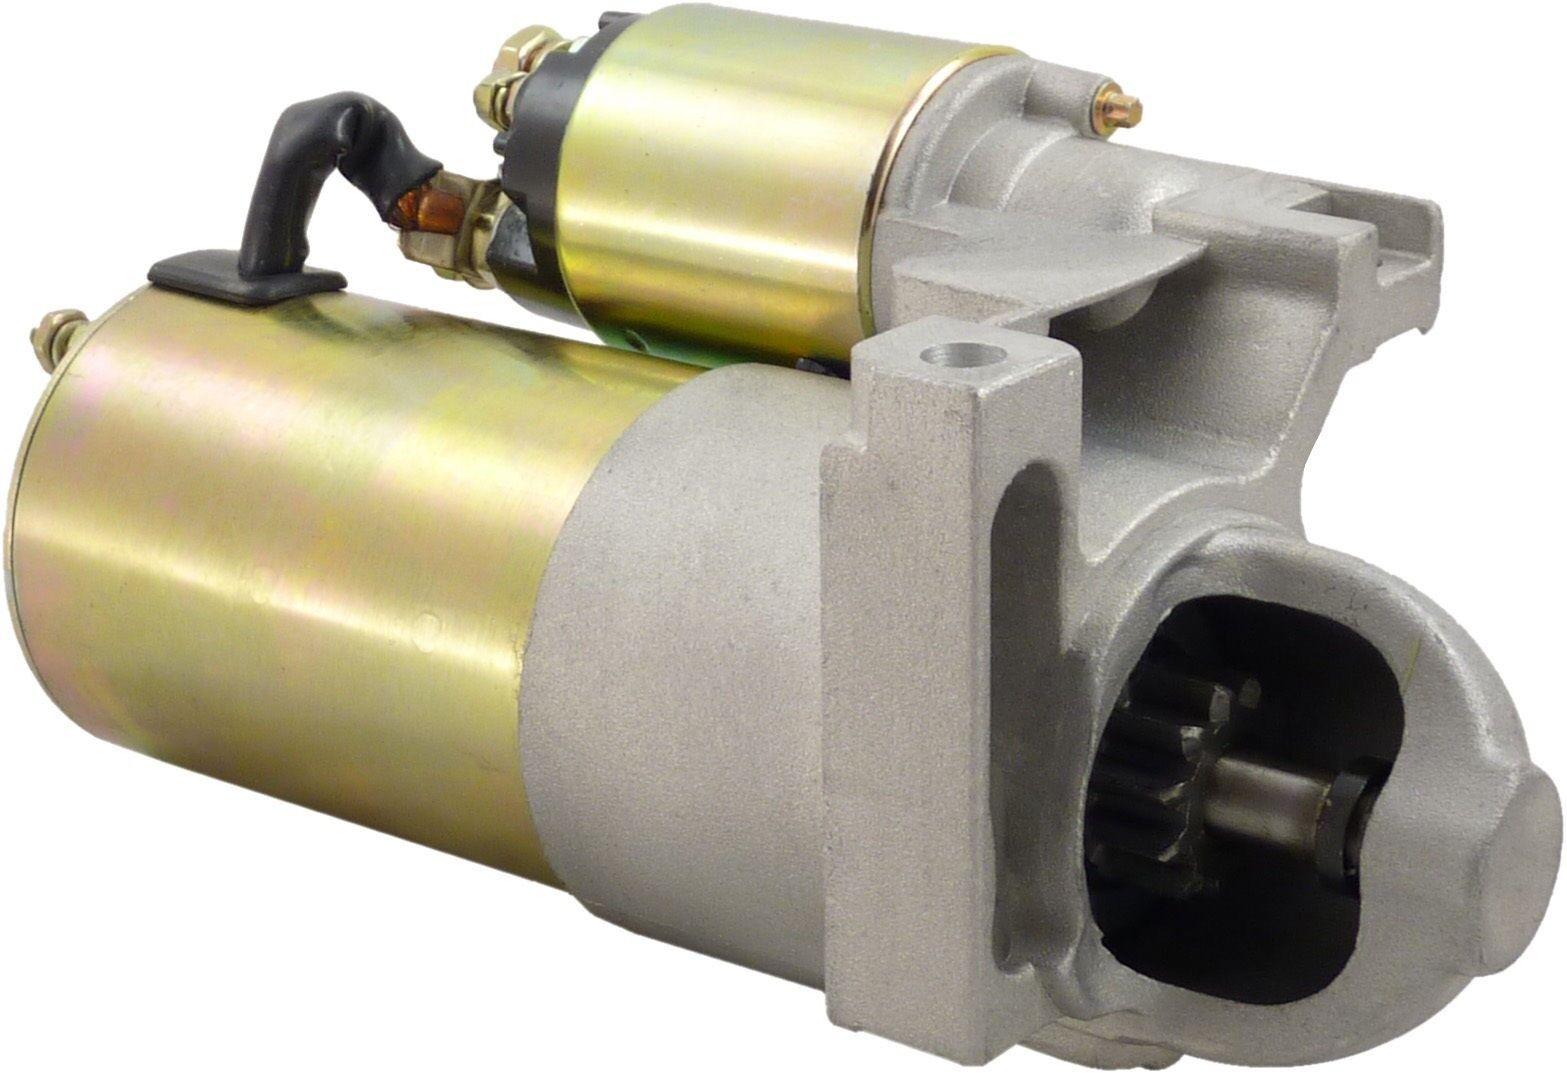 SAEJ1171 Certified New Marine Starter Mecruiser Stern Drive 3.0 3.0LX 9000763